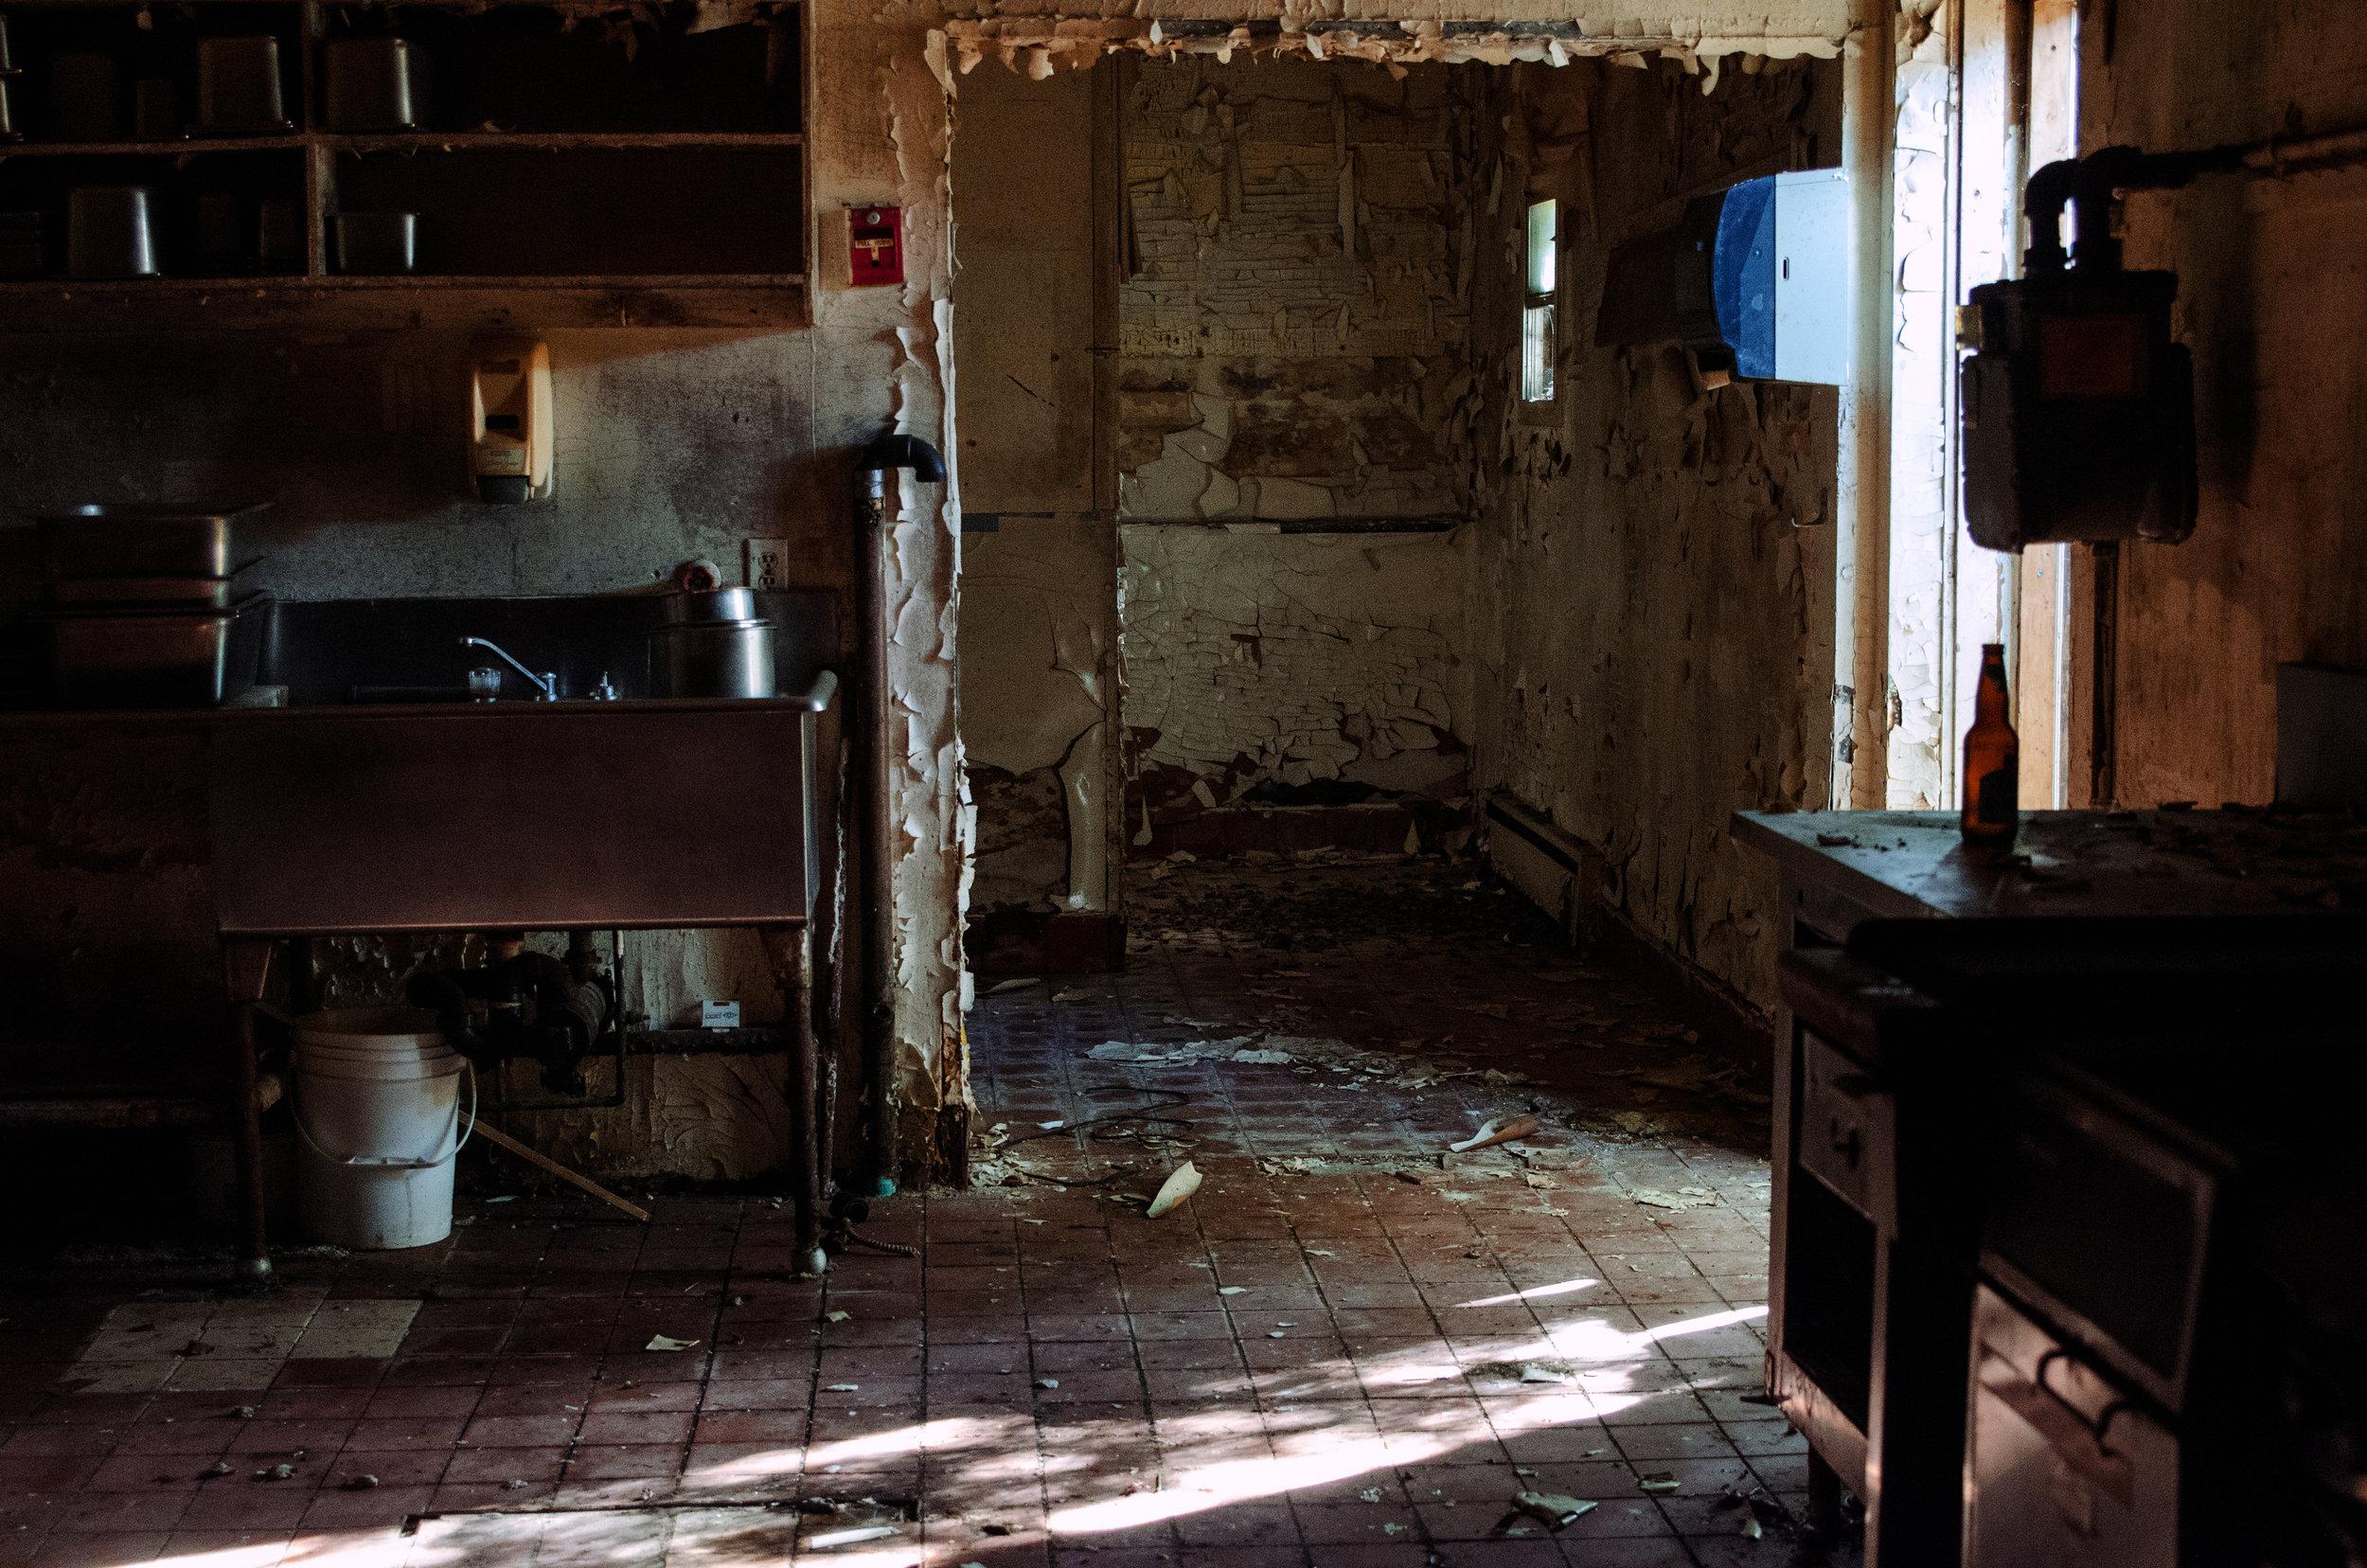 Jenkins, Cheyenne. Blue Bird Kitchen. 2017. Digital Photography. Wawa, Ontario